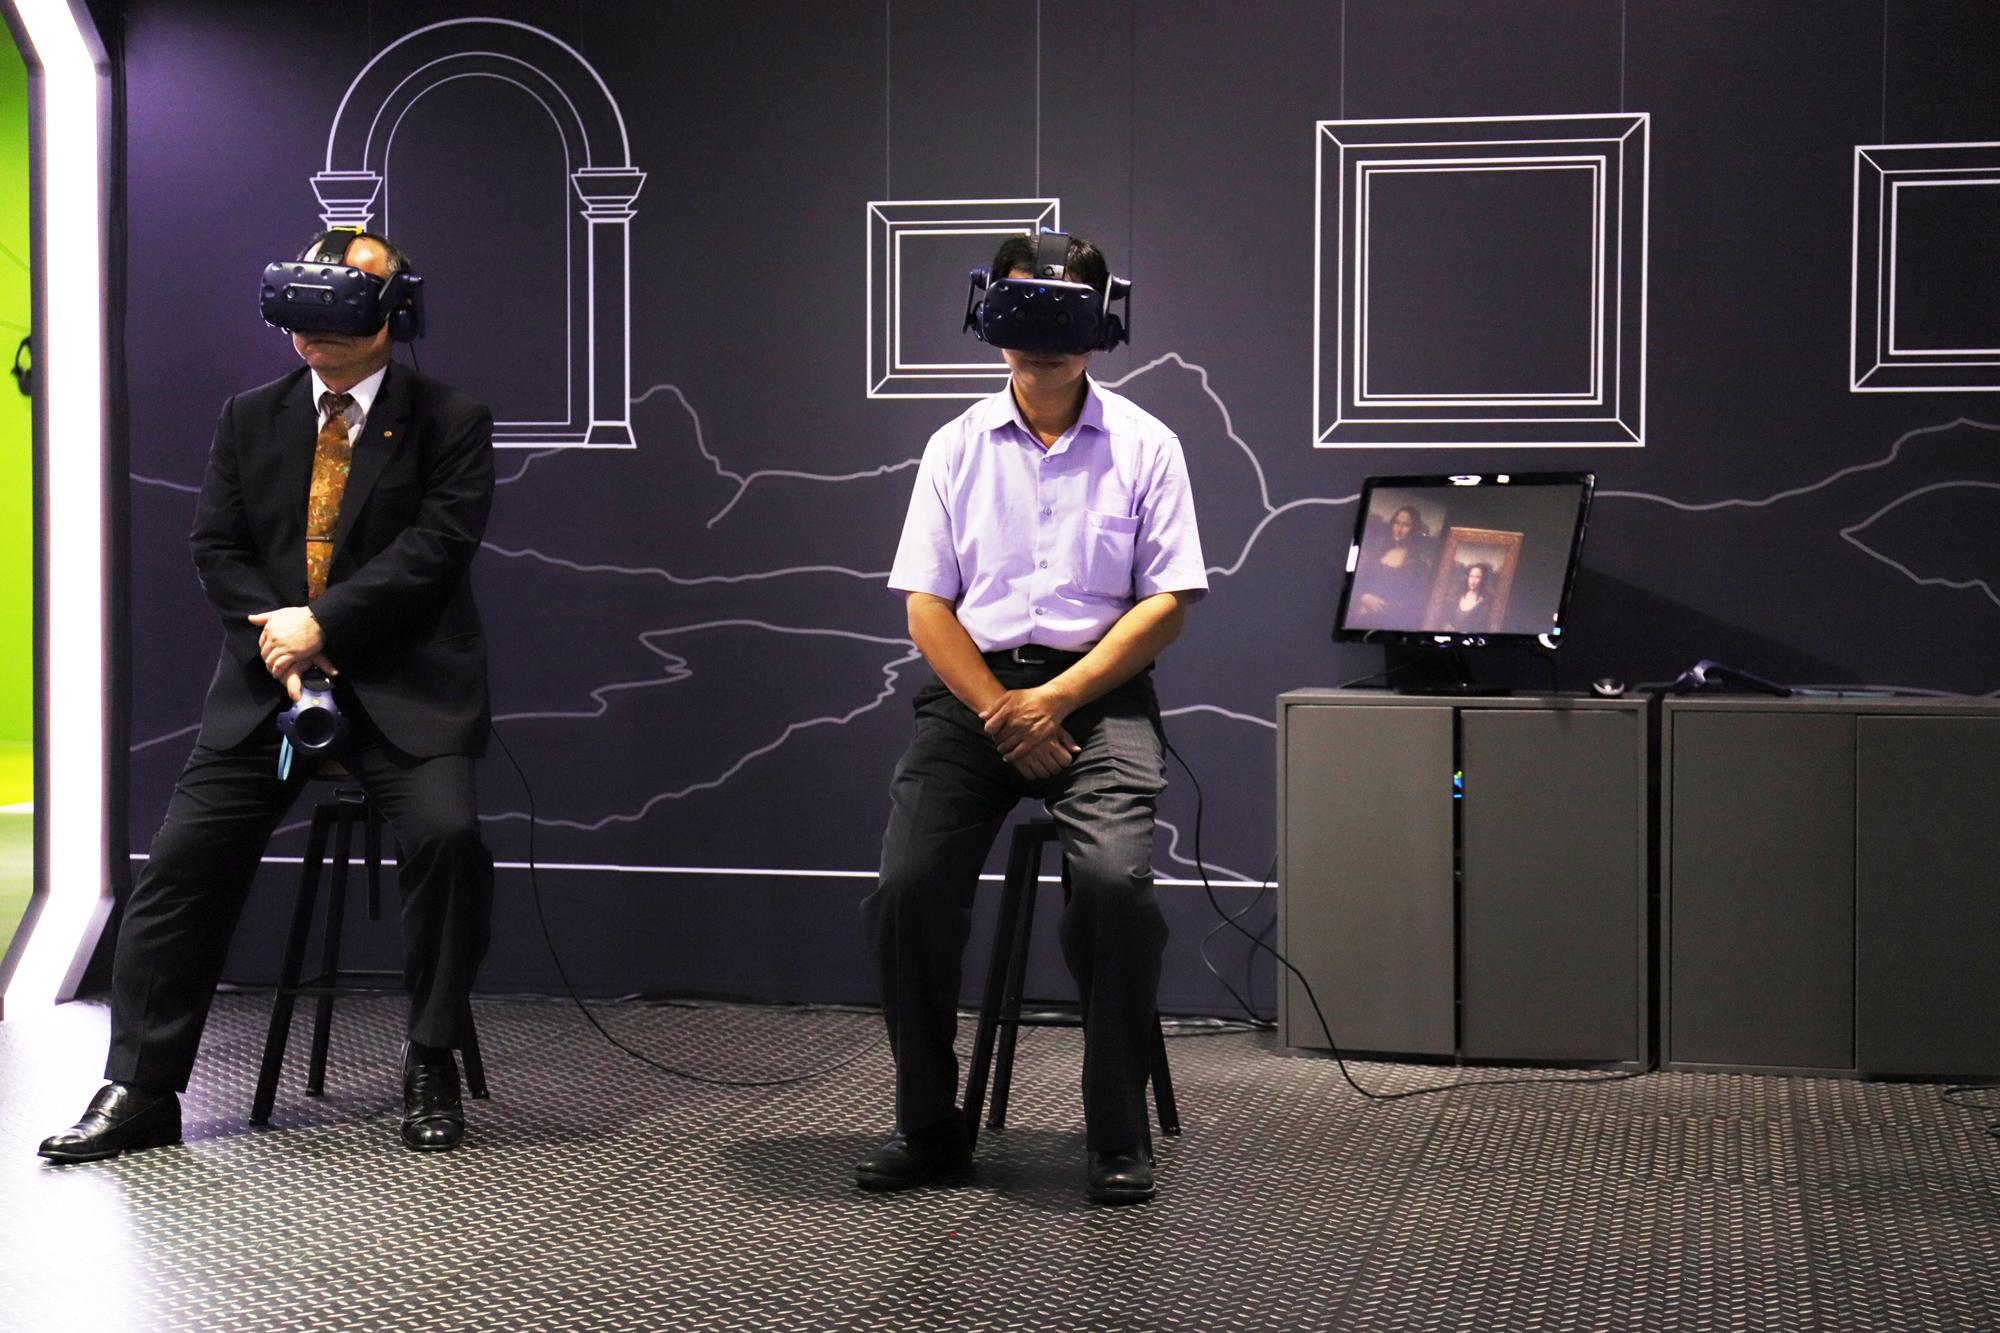 HTC新聞稿(左起高雄市政府秘書長陳鴻益、經濟部工業局顏鳳旗副組長體驗蒙娜麗莎越界視野VR體驗)